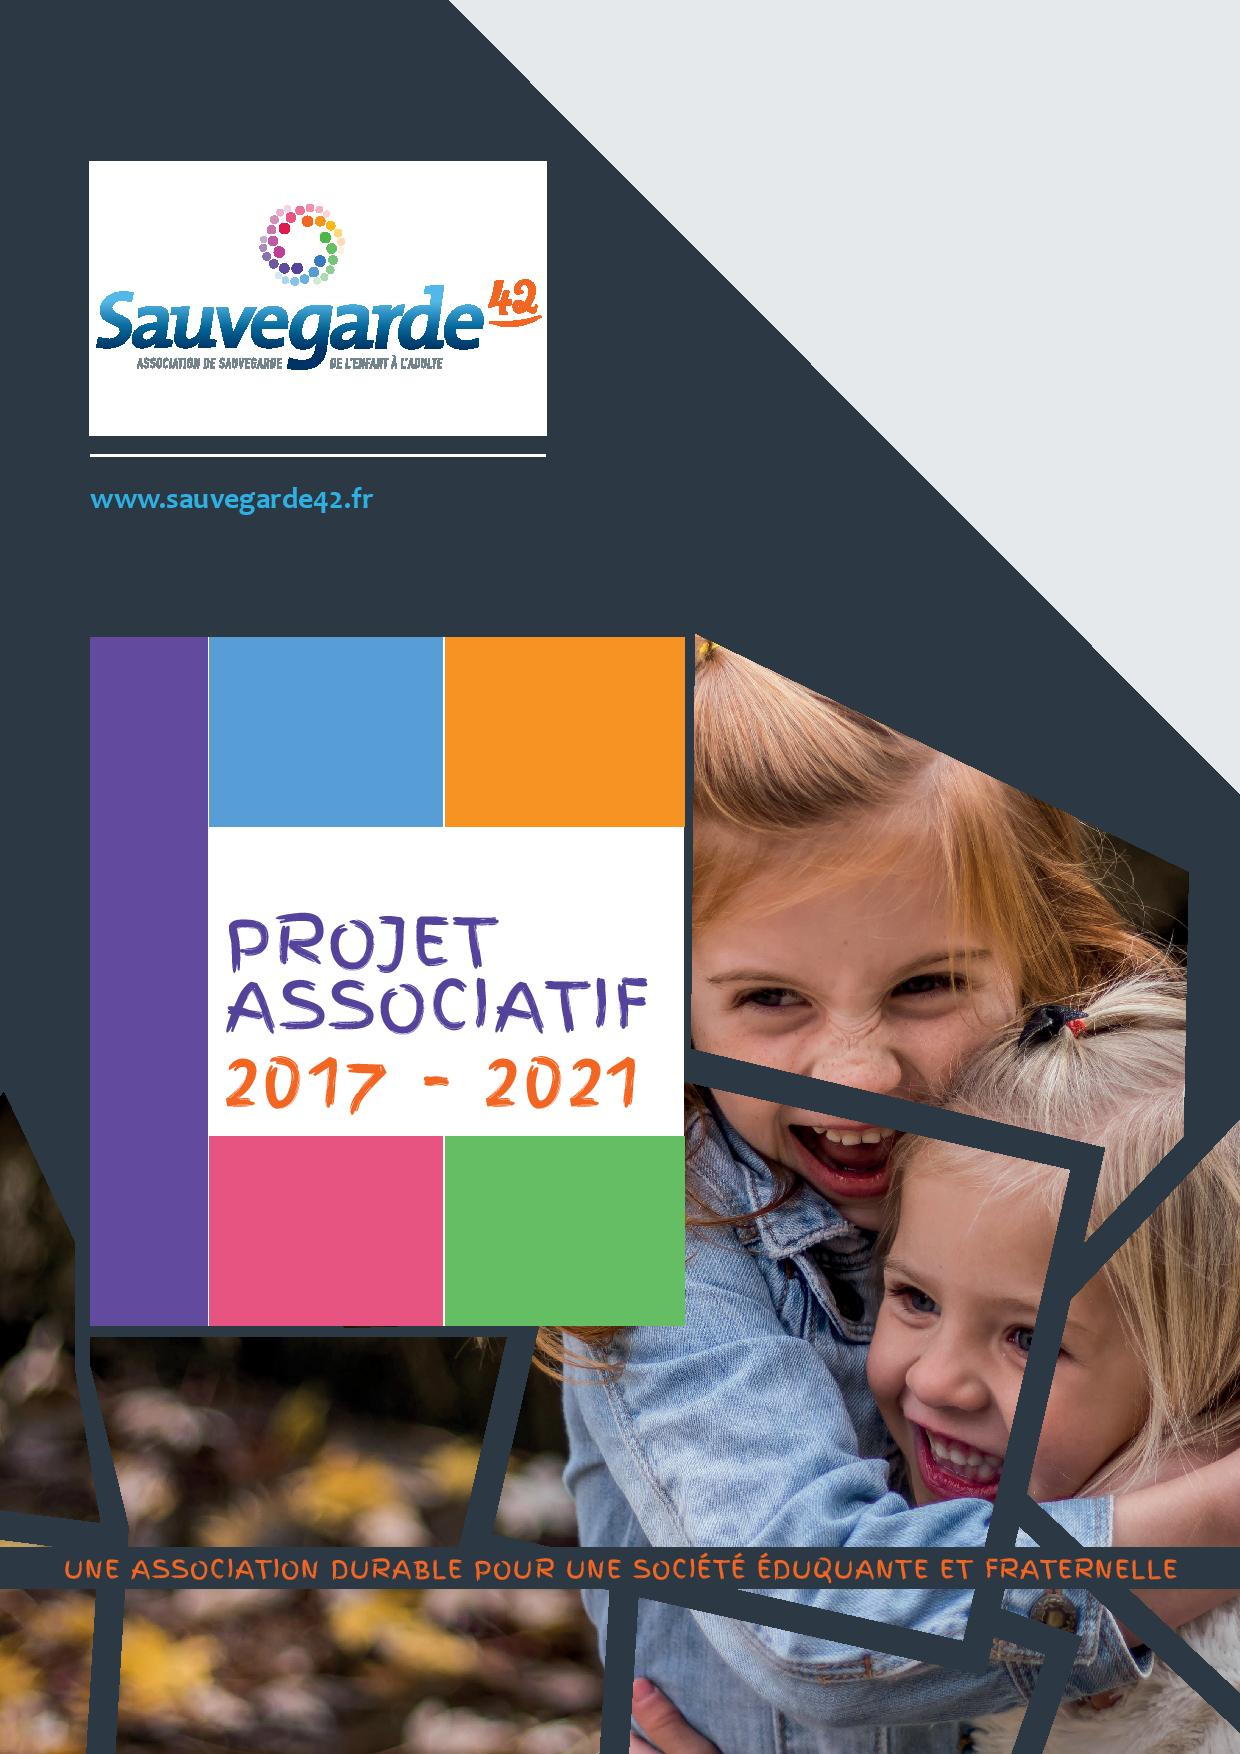 Projet-Associatif-2017-2021-BAT-FR-page-001